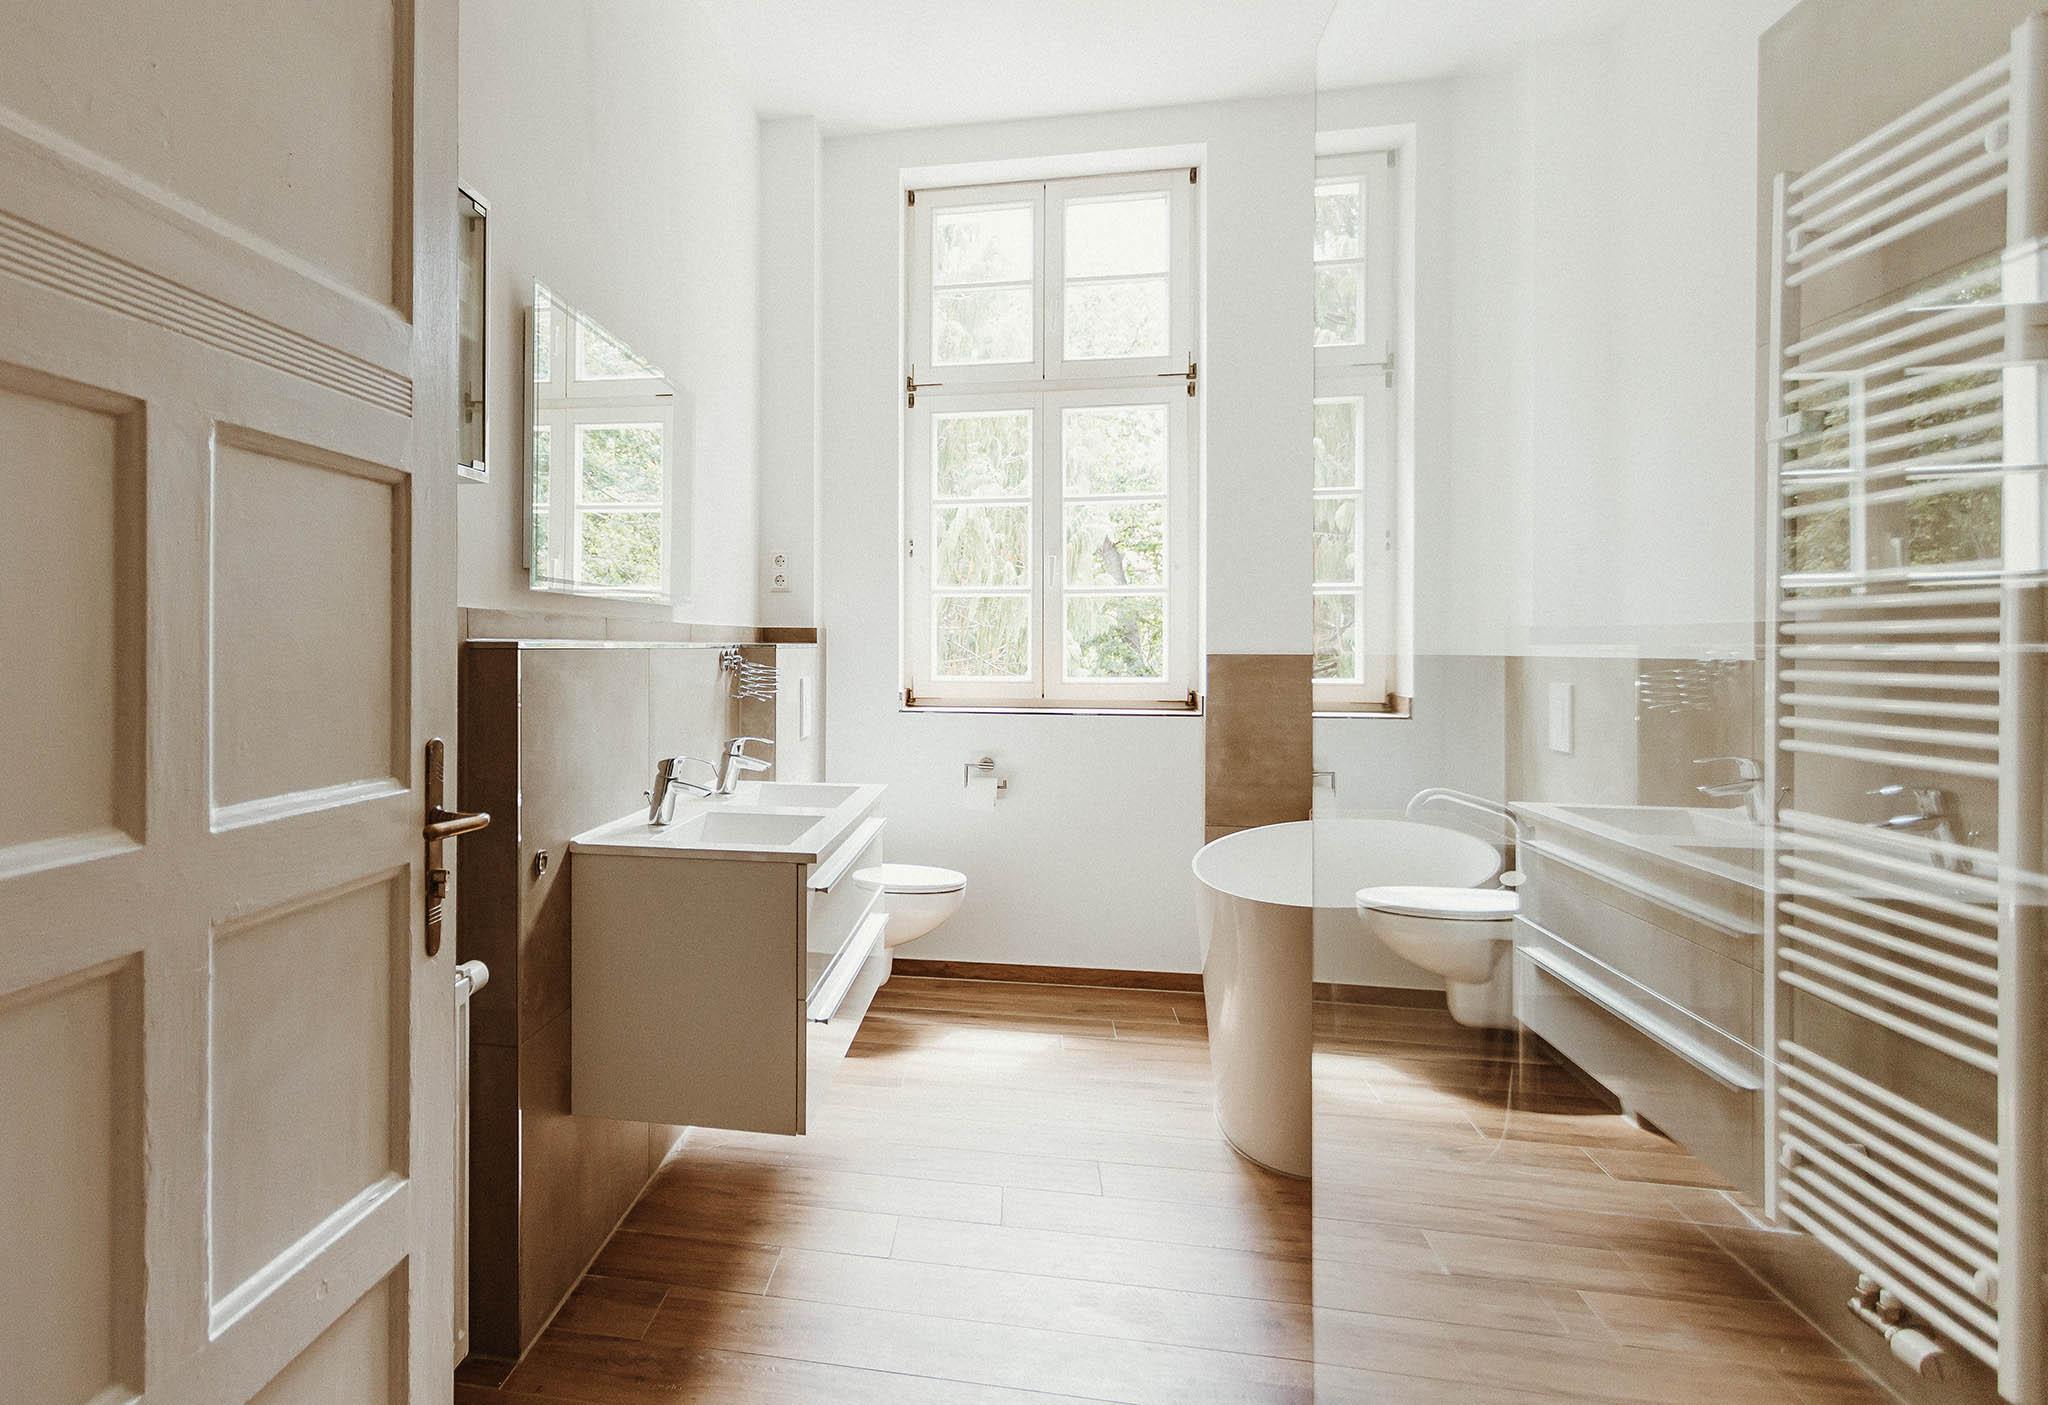 florianfeg_immobilien_sanierung_interior_bad_2